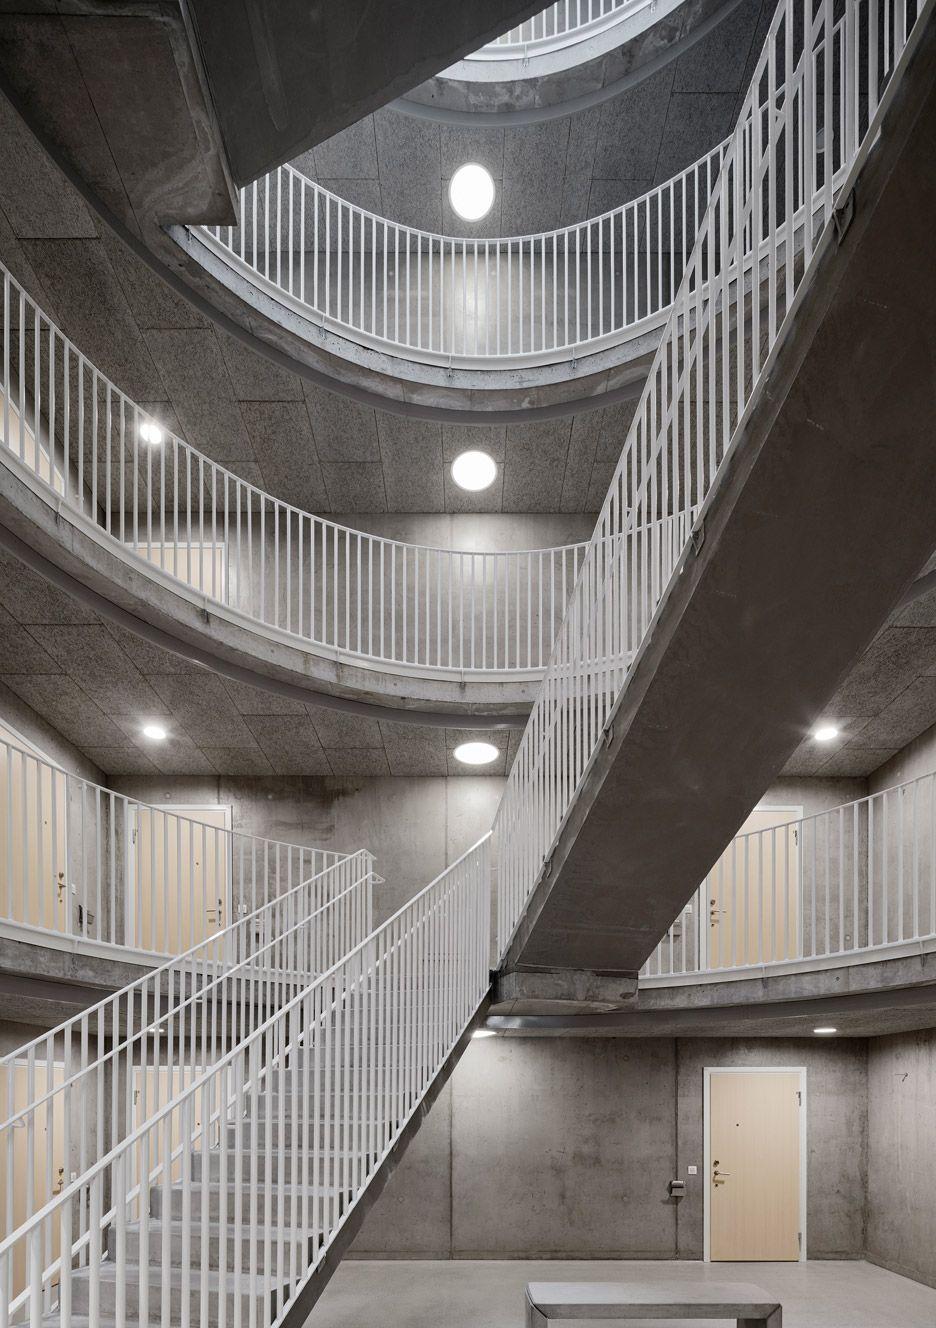 Tham Videgard S Vastra Kajen Housing Has Rows Of Inverted Arches